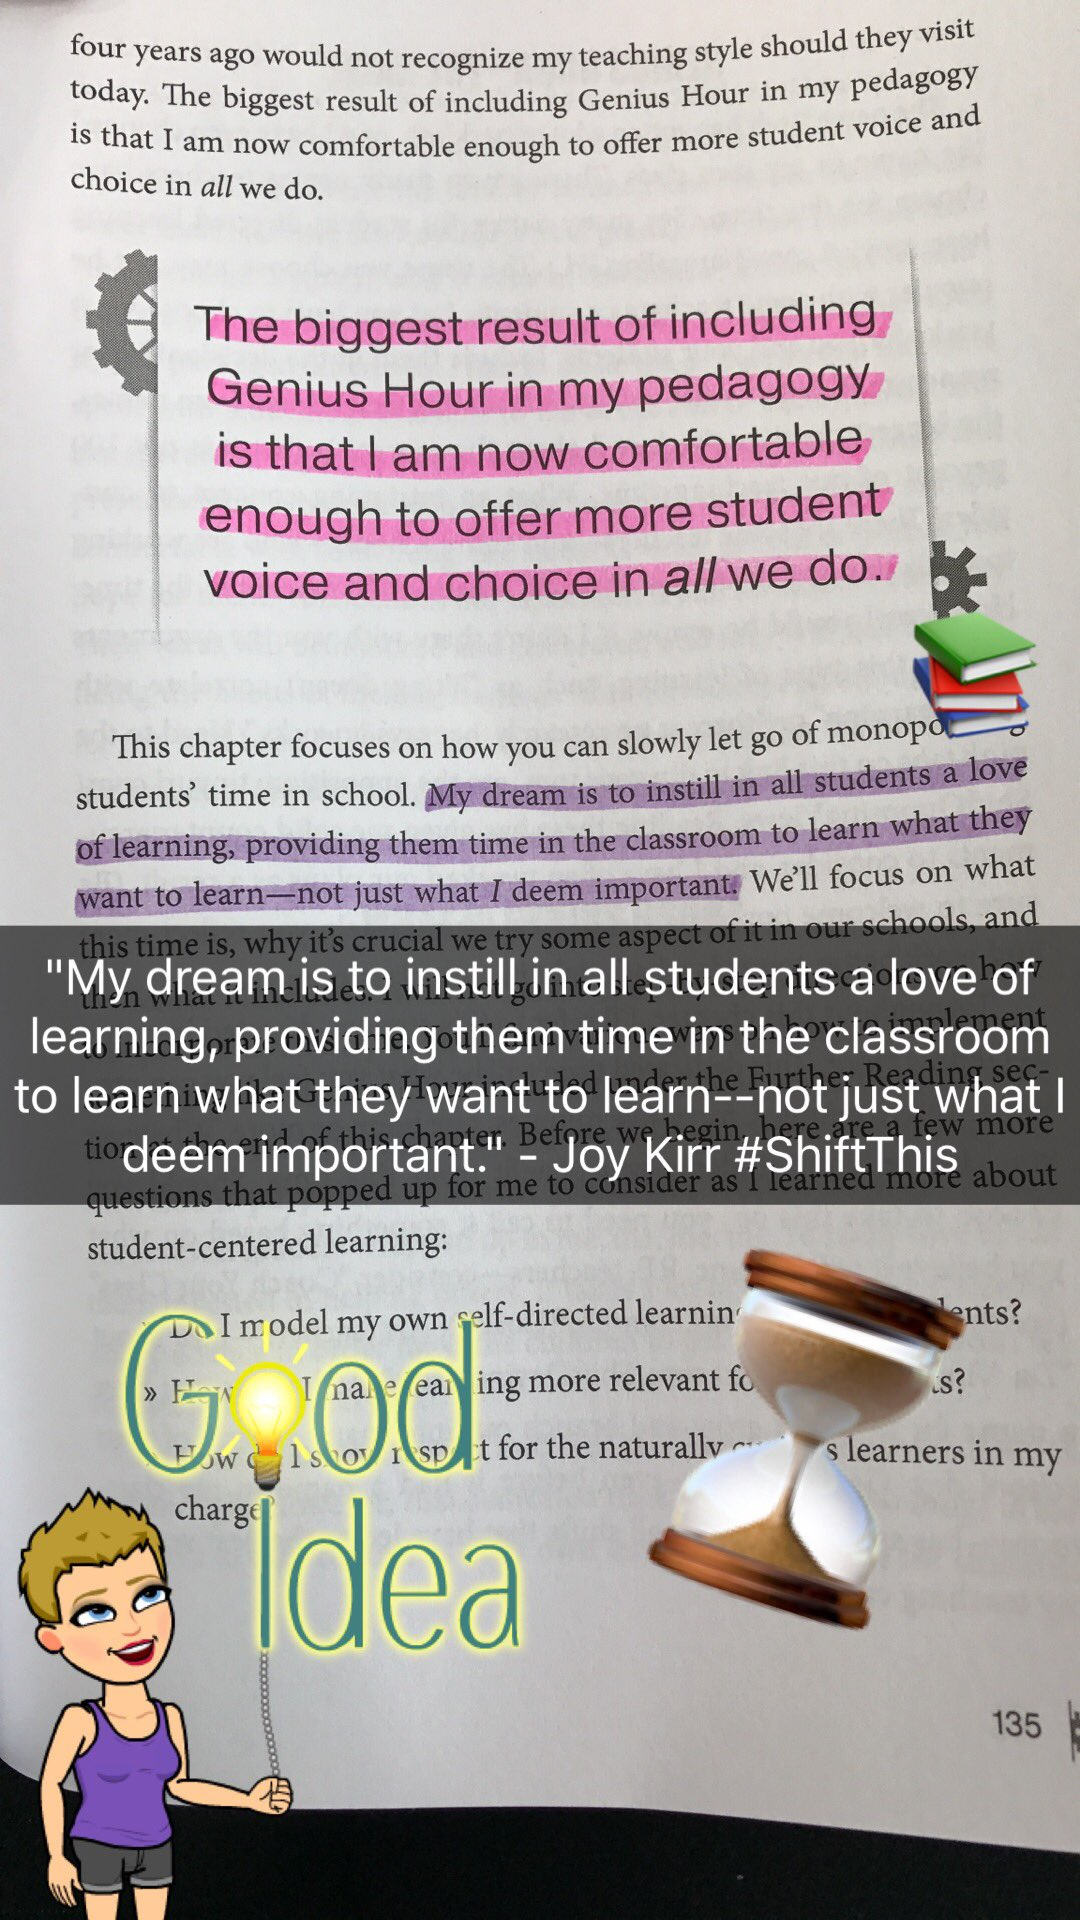 Goals for the new school year! #GeniusHour @JoyKirr @TaraMartinEDU #ShiftThis #BookSnaps https://t.co/nzZ3xlIEbX